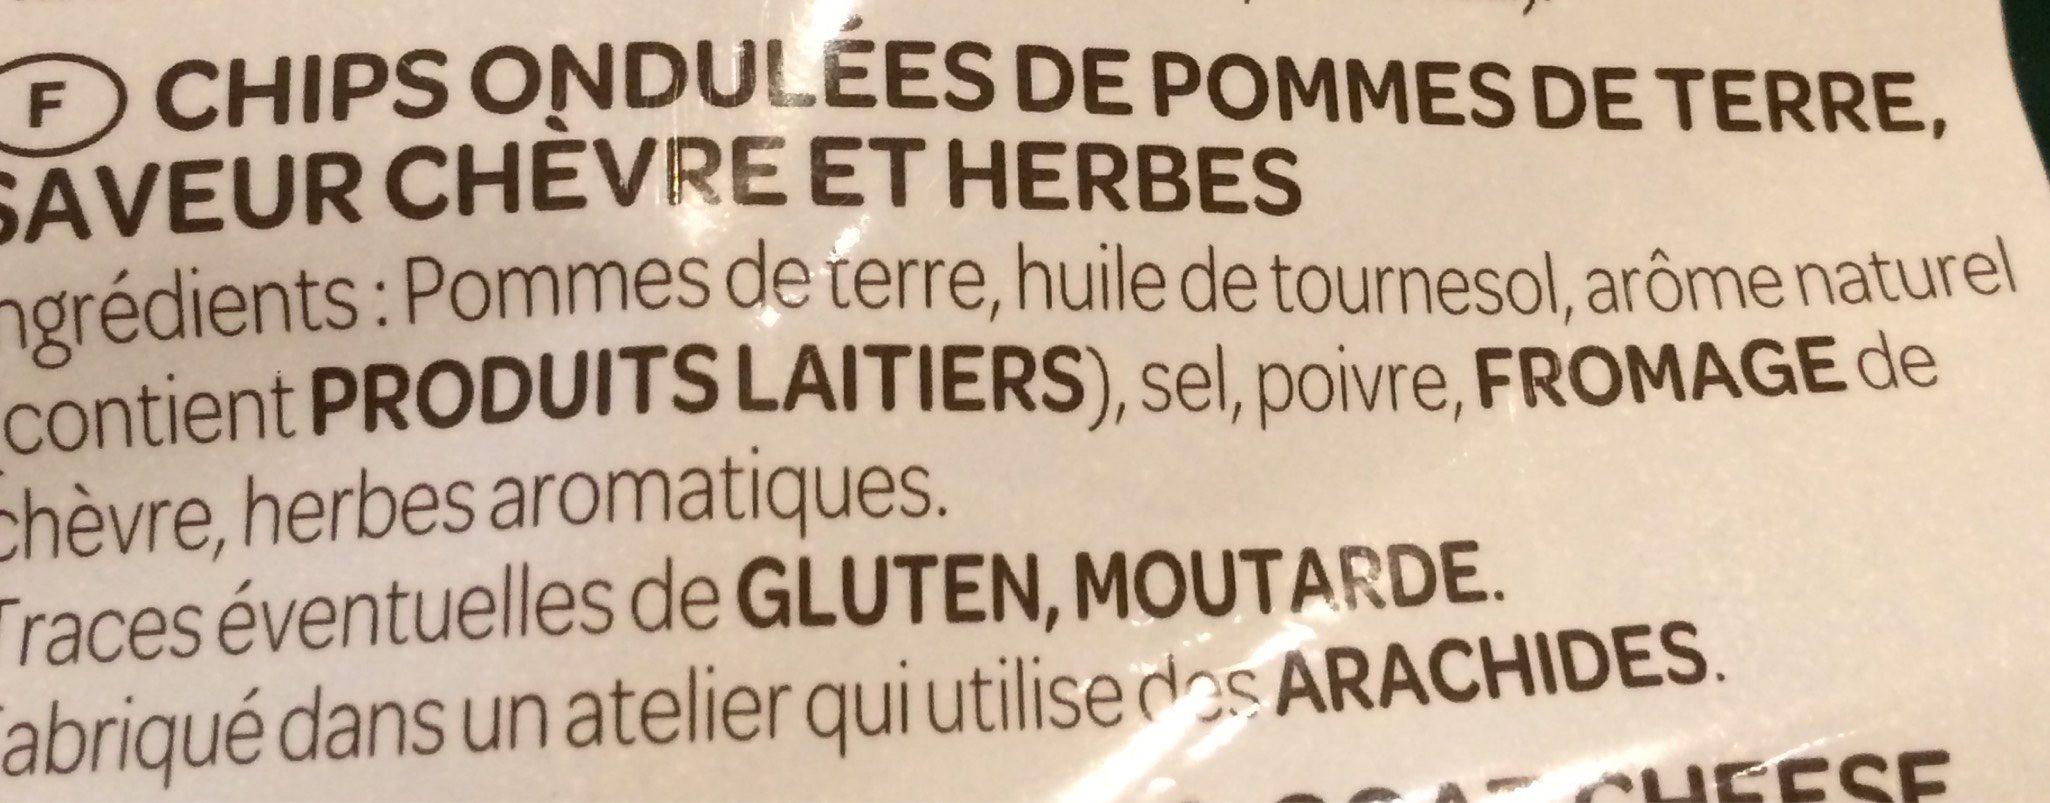 Chips saveur Chèvre Chaud & Herbes 360g - Ingredients - fr